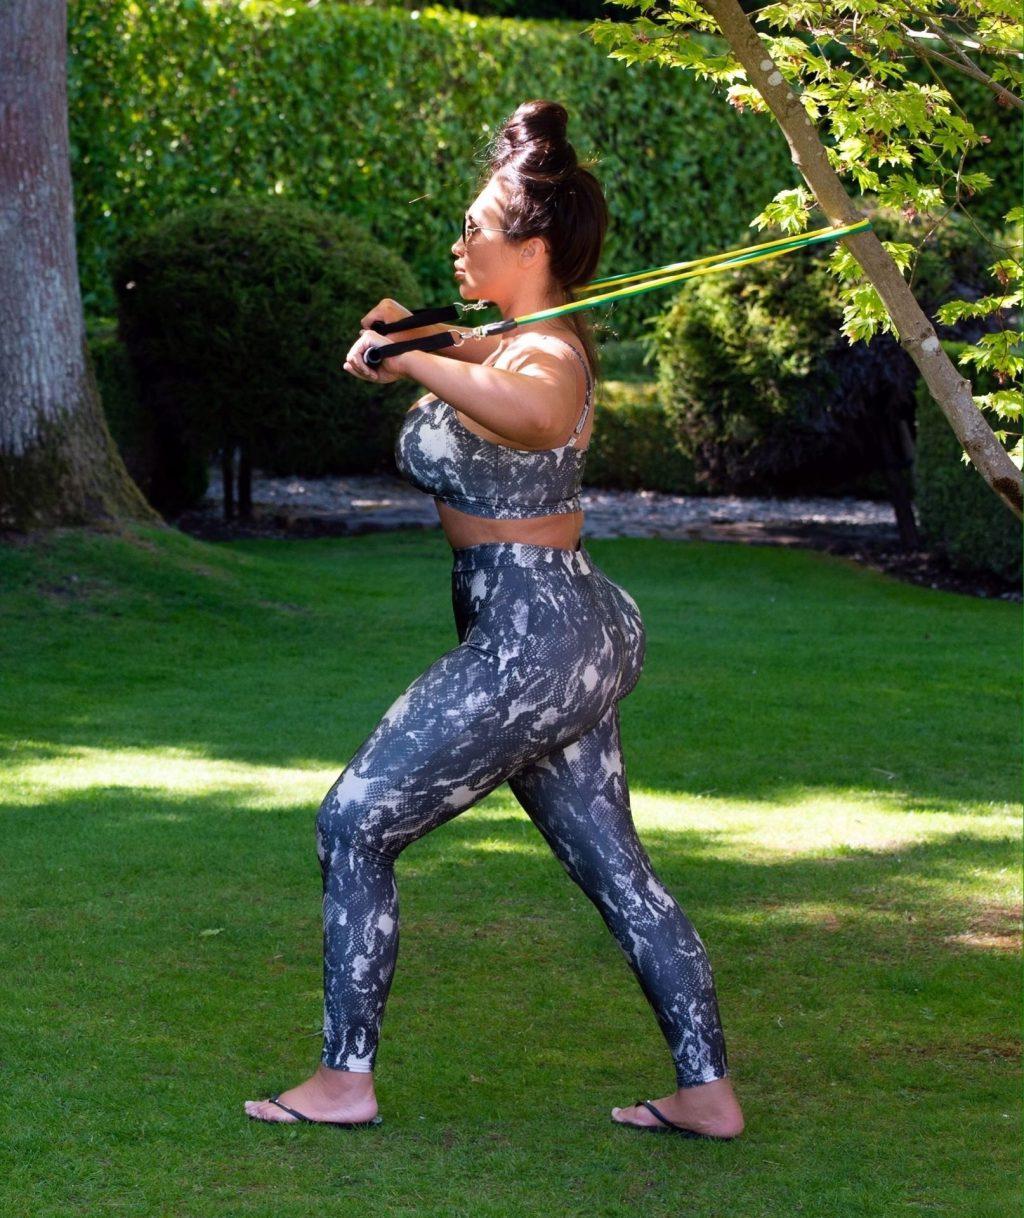 Lauren Goodger Is Seen Having an Early Morning Workout in Essex (16 Photos)